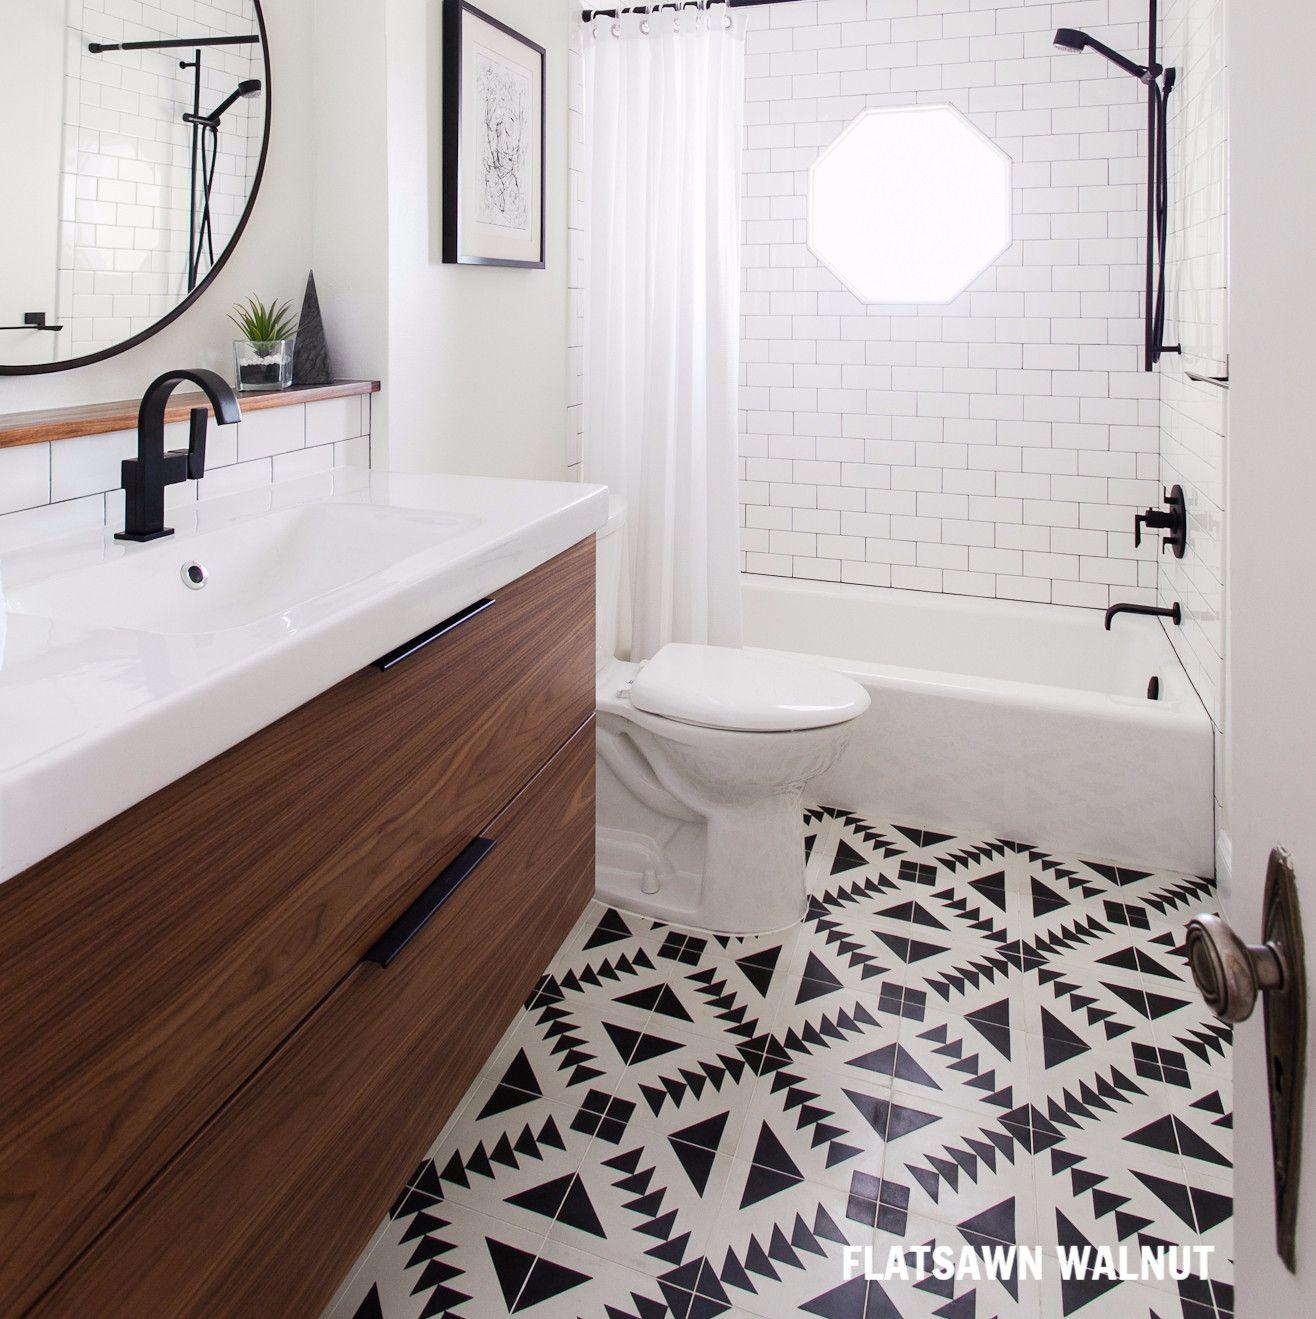 Ikea godmorgon bathroom vanity - Godmorgon